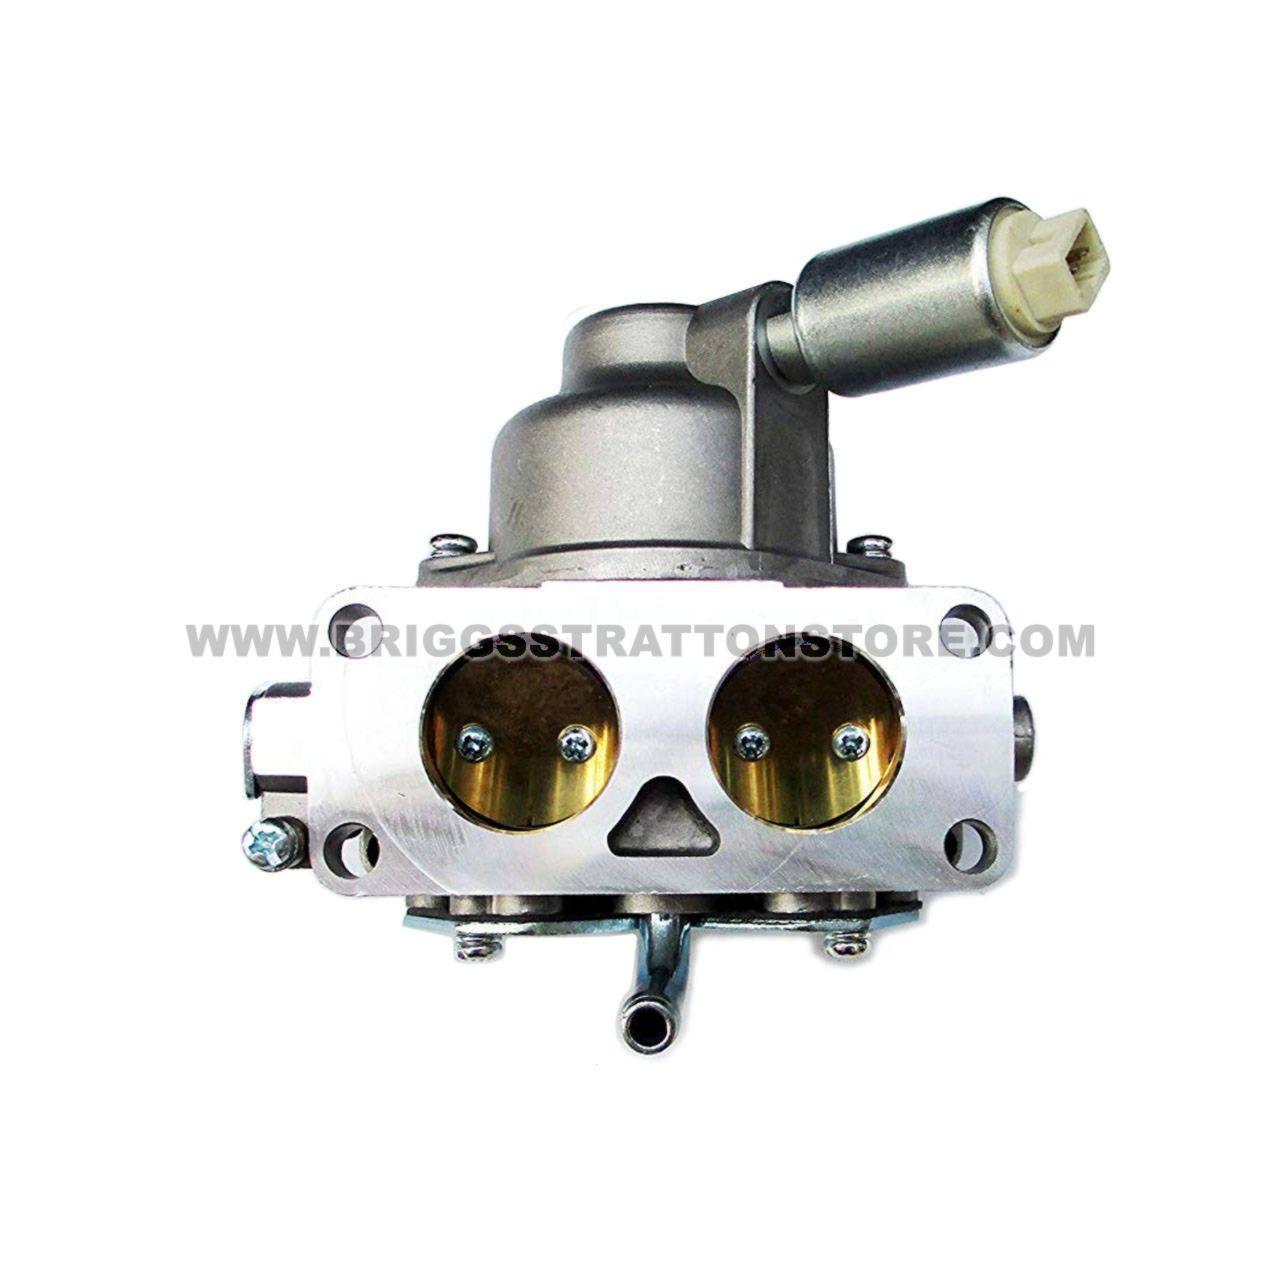 Carburetor Overhaul Kit For Briggs /& Stratton Part# 799132